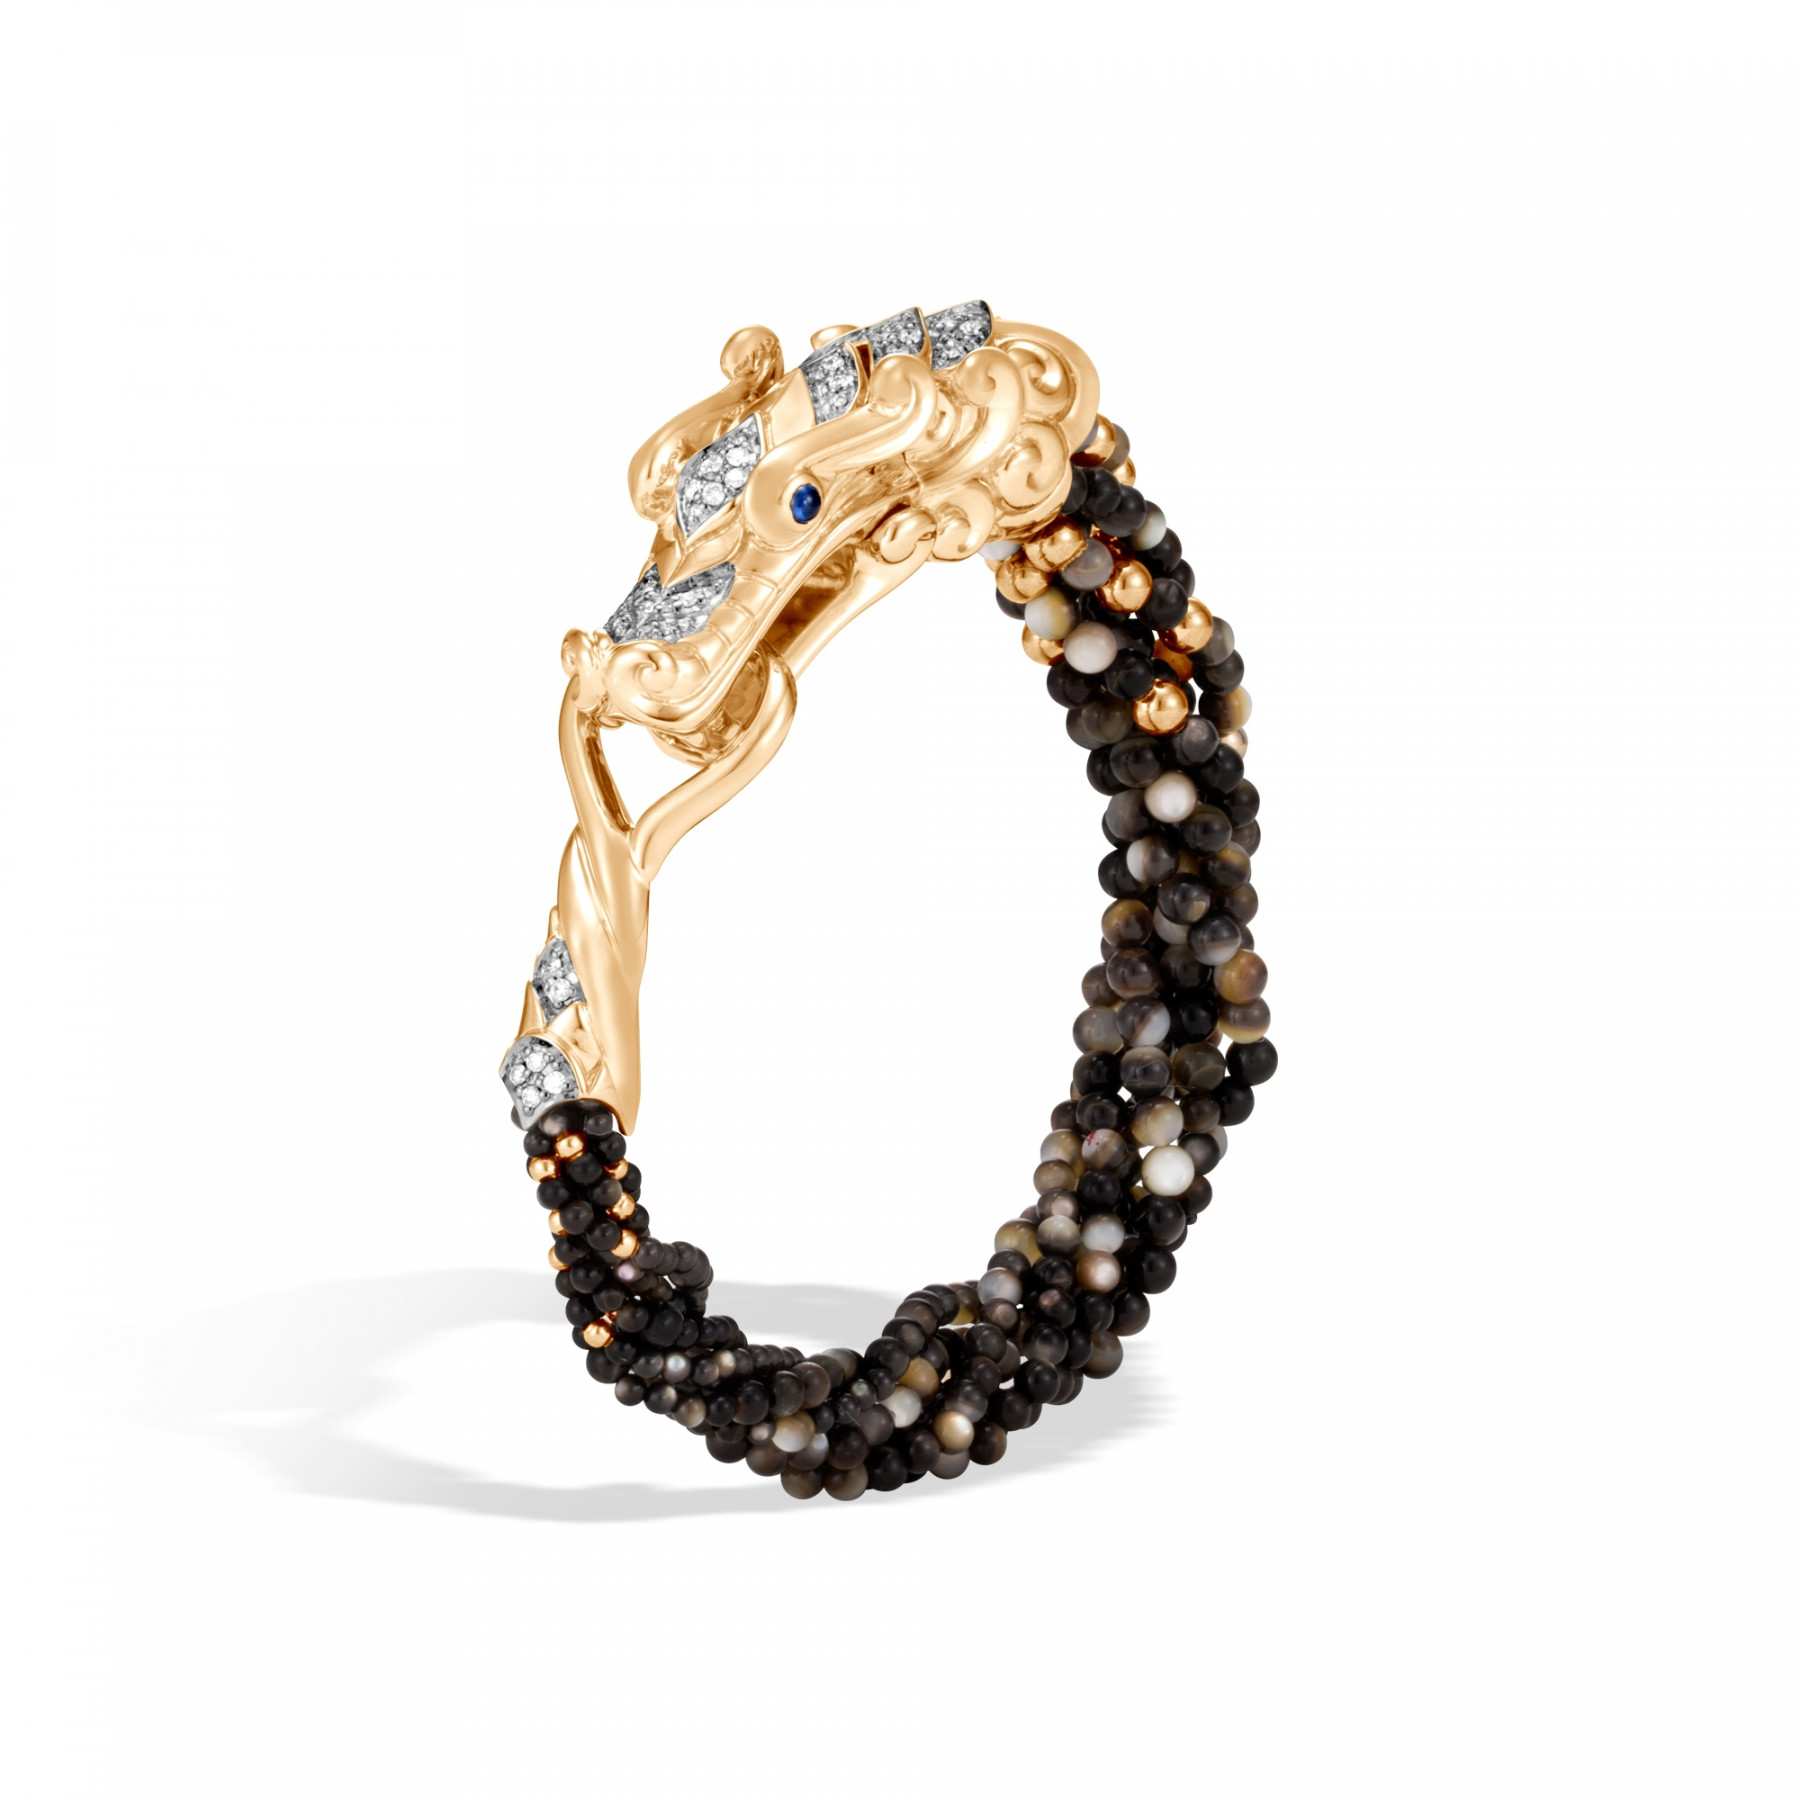 John Hardy Legends Naga Small Black Mother of Pearl Bead Bracelet angle view